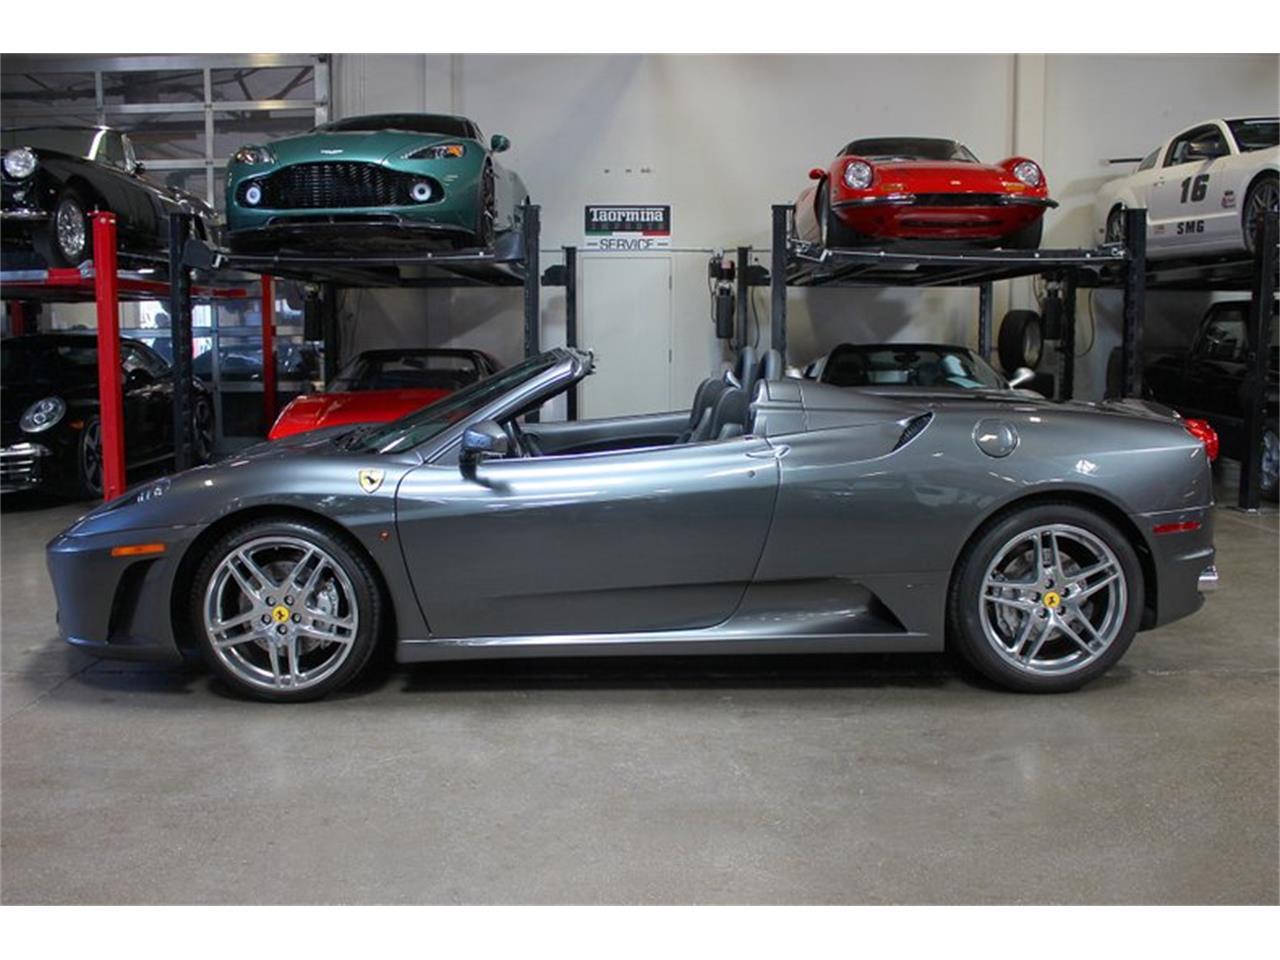 2006 Ferrari 430 (CC-1207930) for sale in San Carlos, California